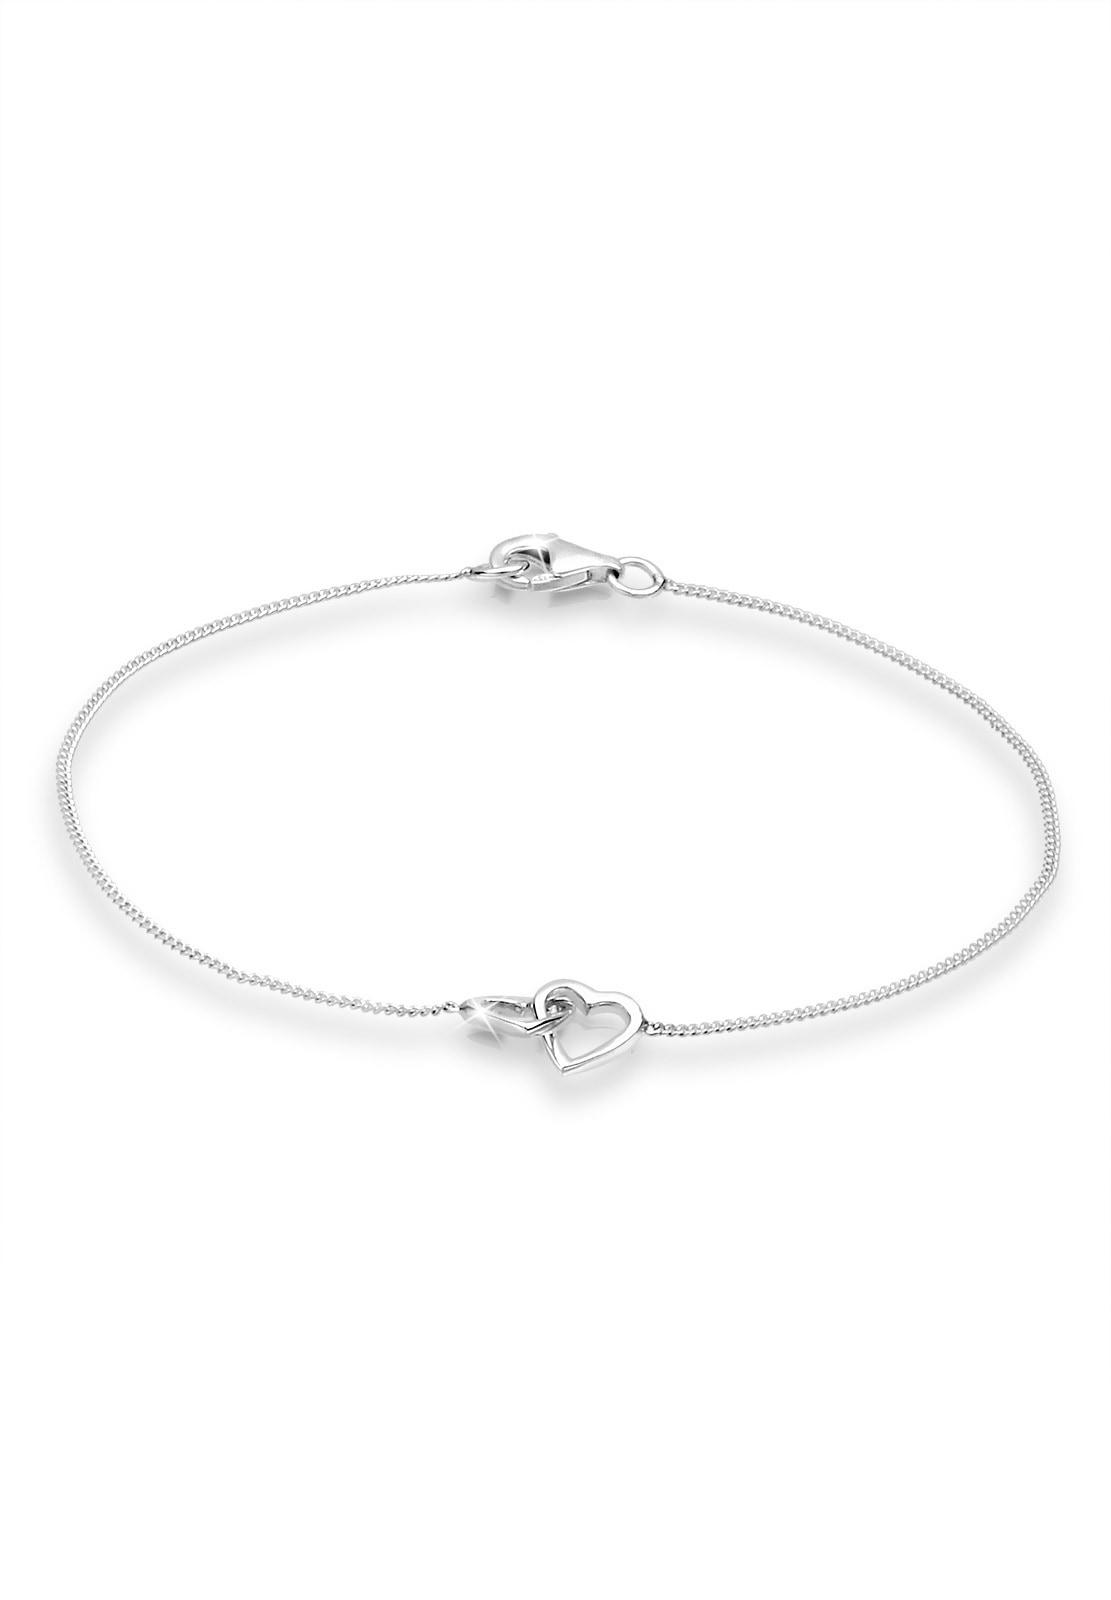 Elli Armband Herzen Verschlungen Lovely 925 Silber   Schmuck > Armbänder > Silberarmbänder   Elli